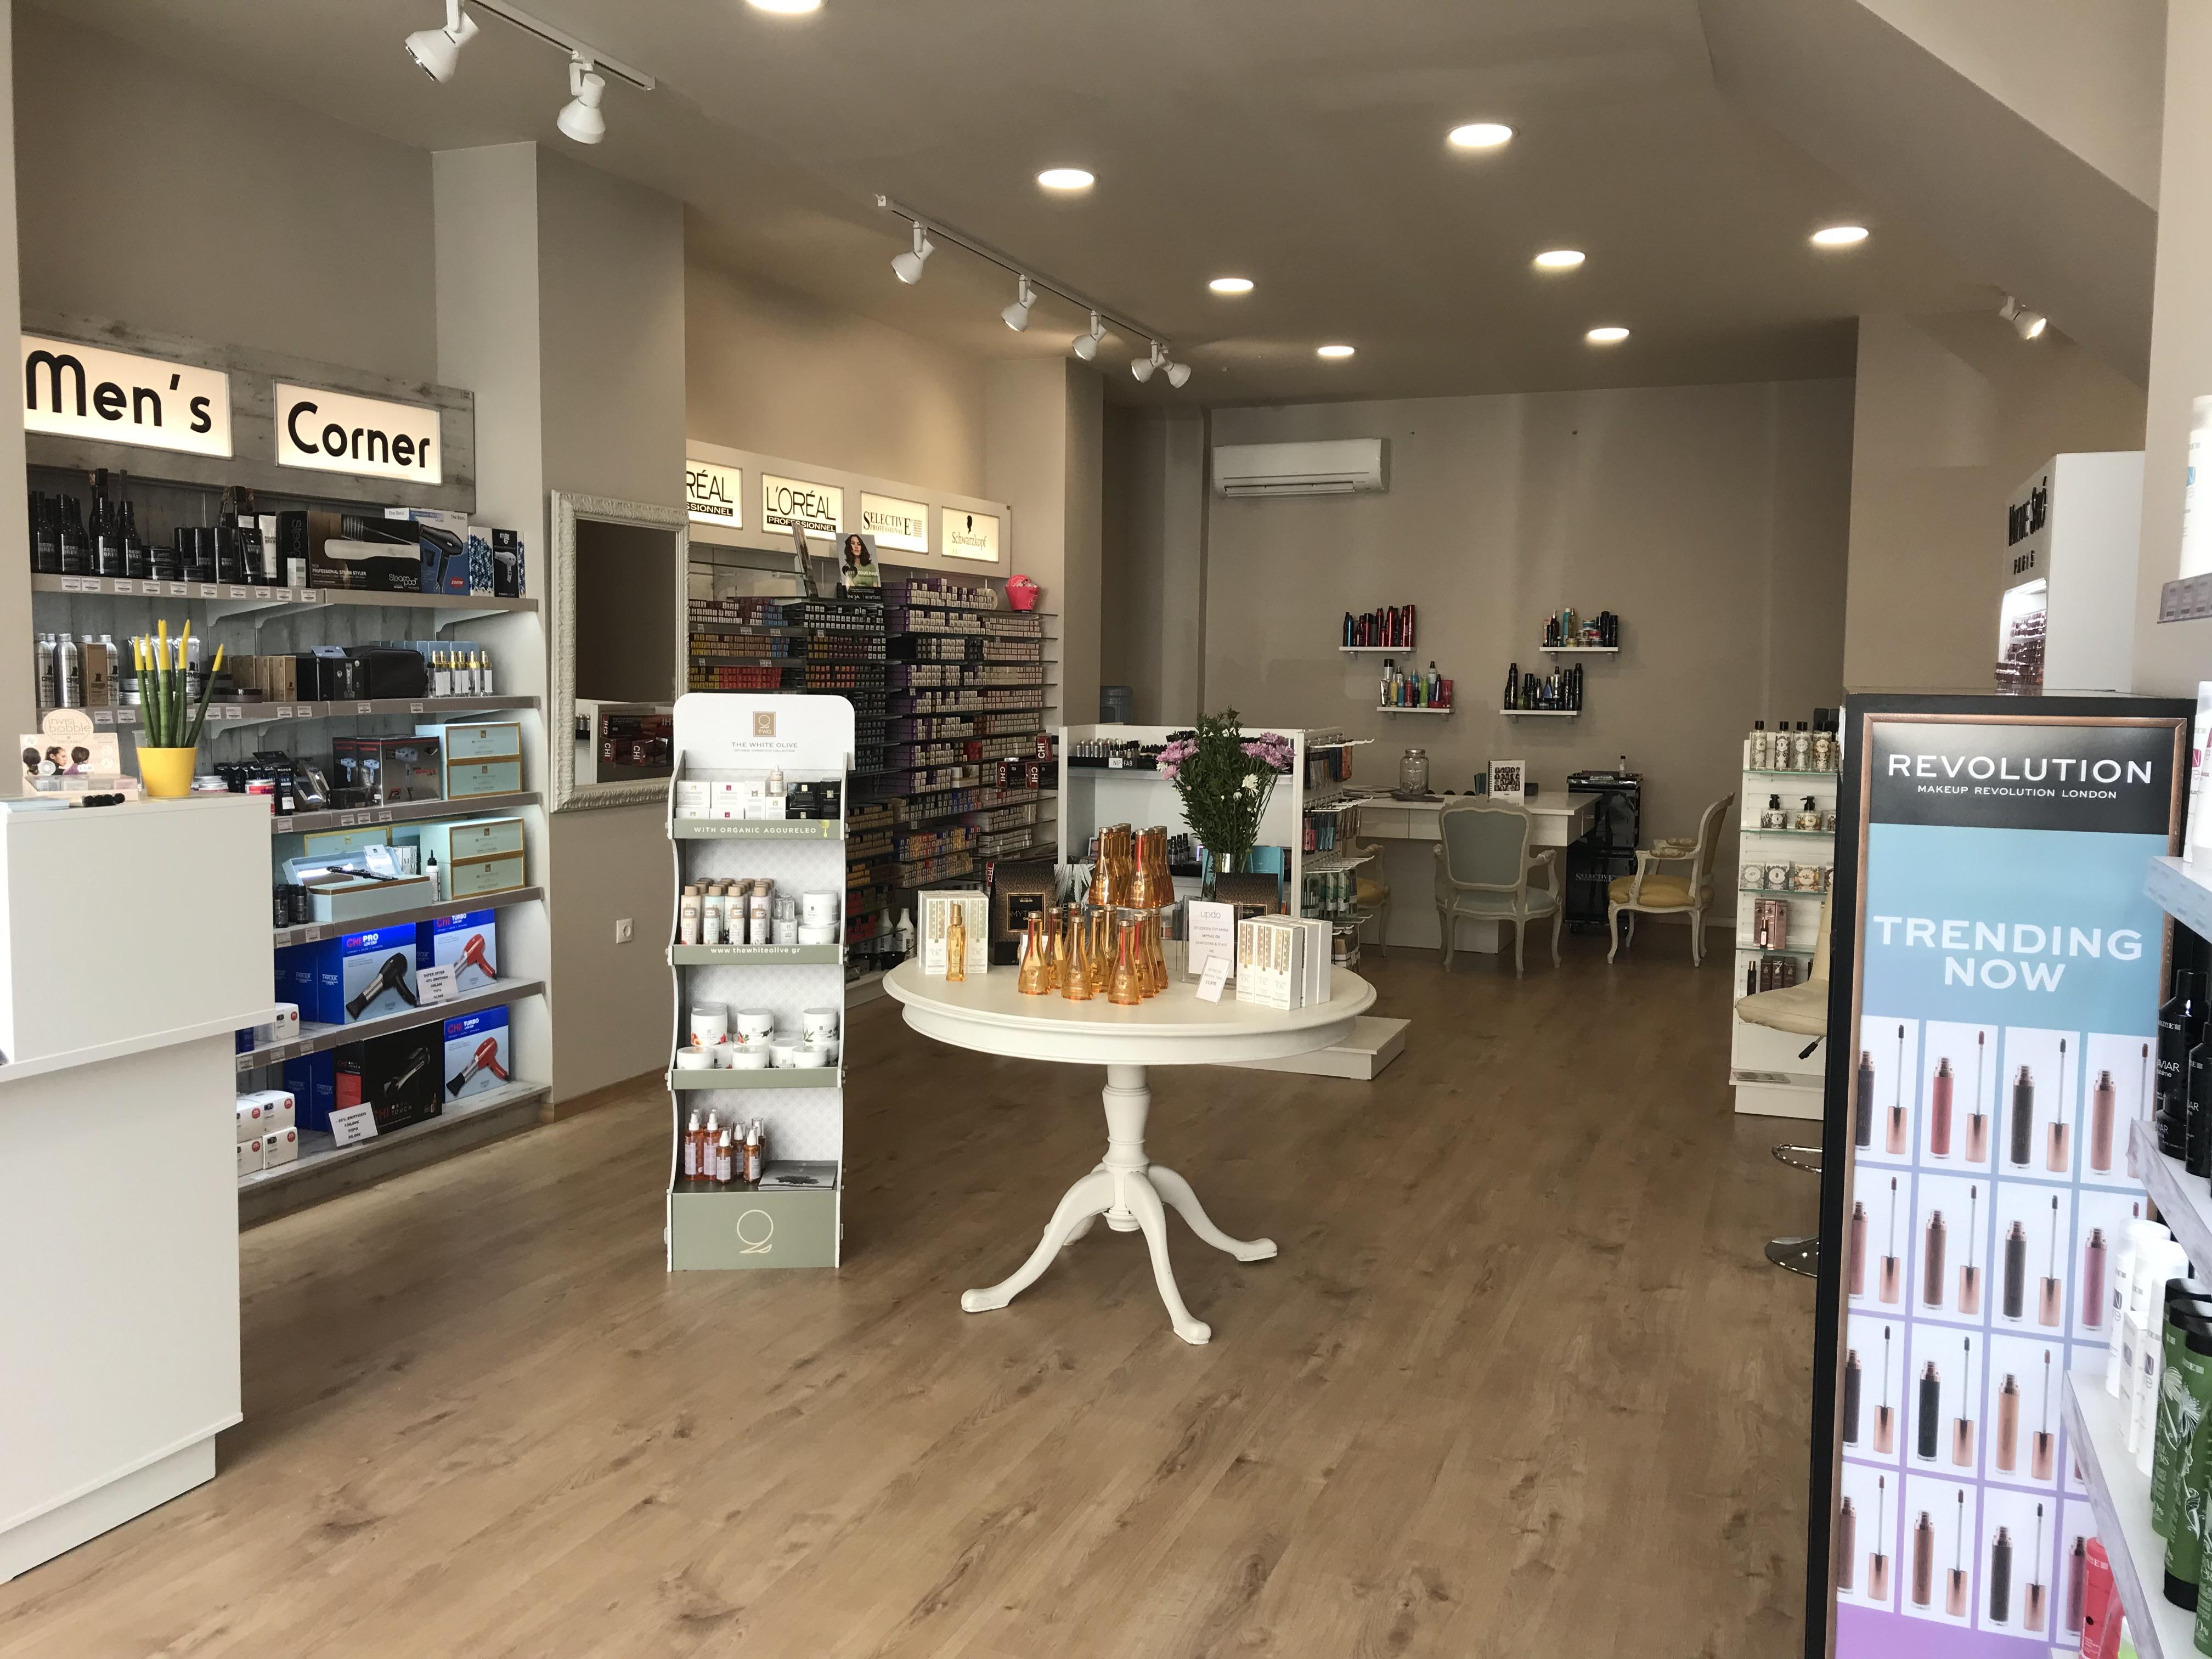 Updo - Επαγγελματικά προϊόντα περιποίησης μαλλιών και ομορφιάς